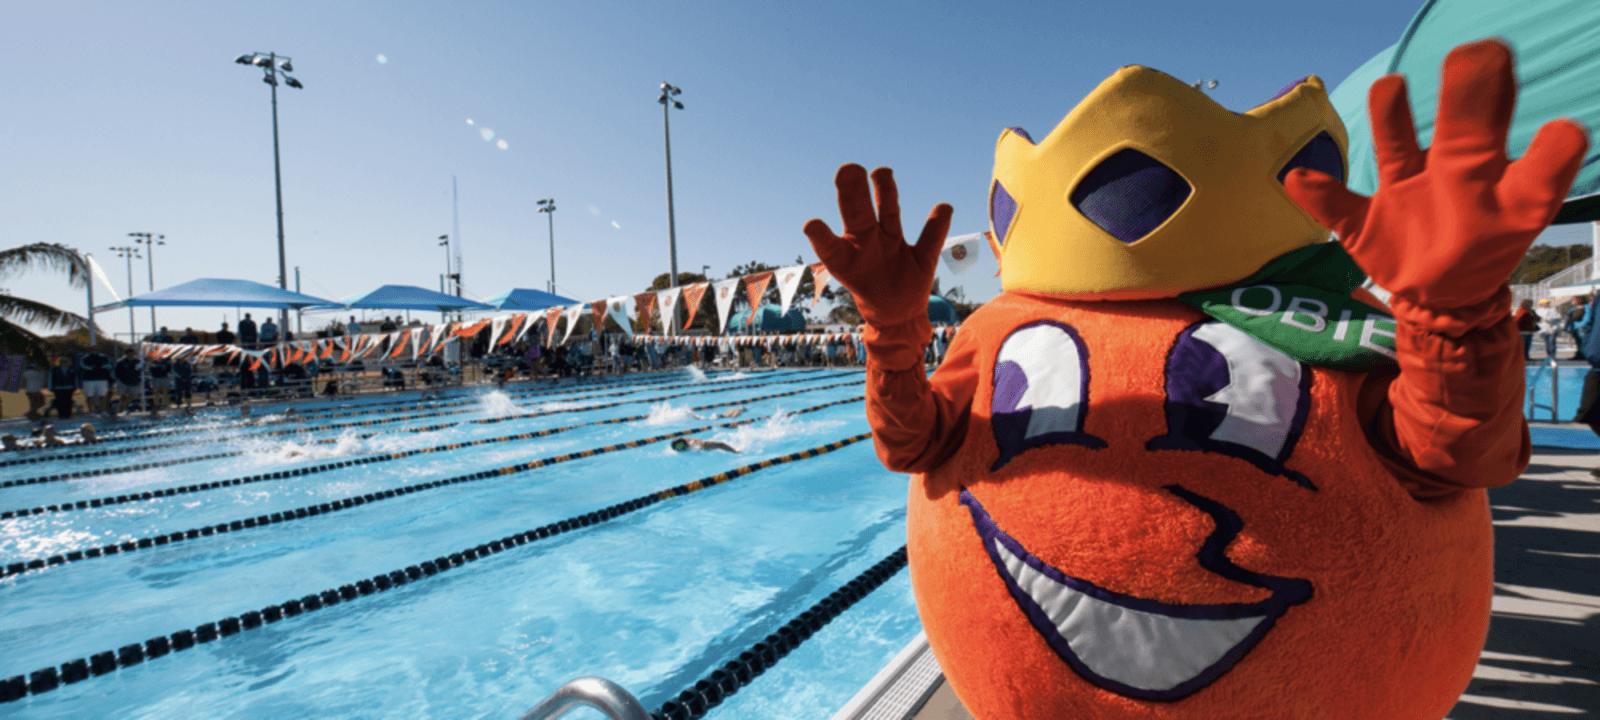 Orange Bowl Swim Classic Persevering in Wake of Hurricane Irma